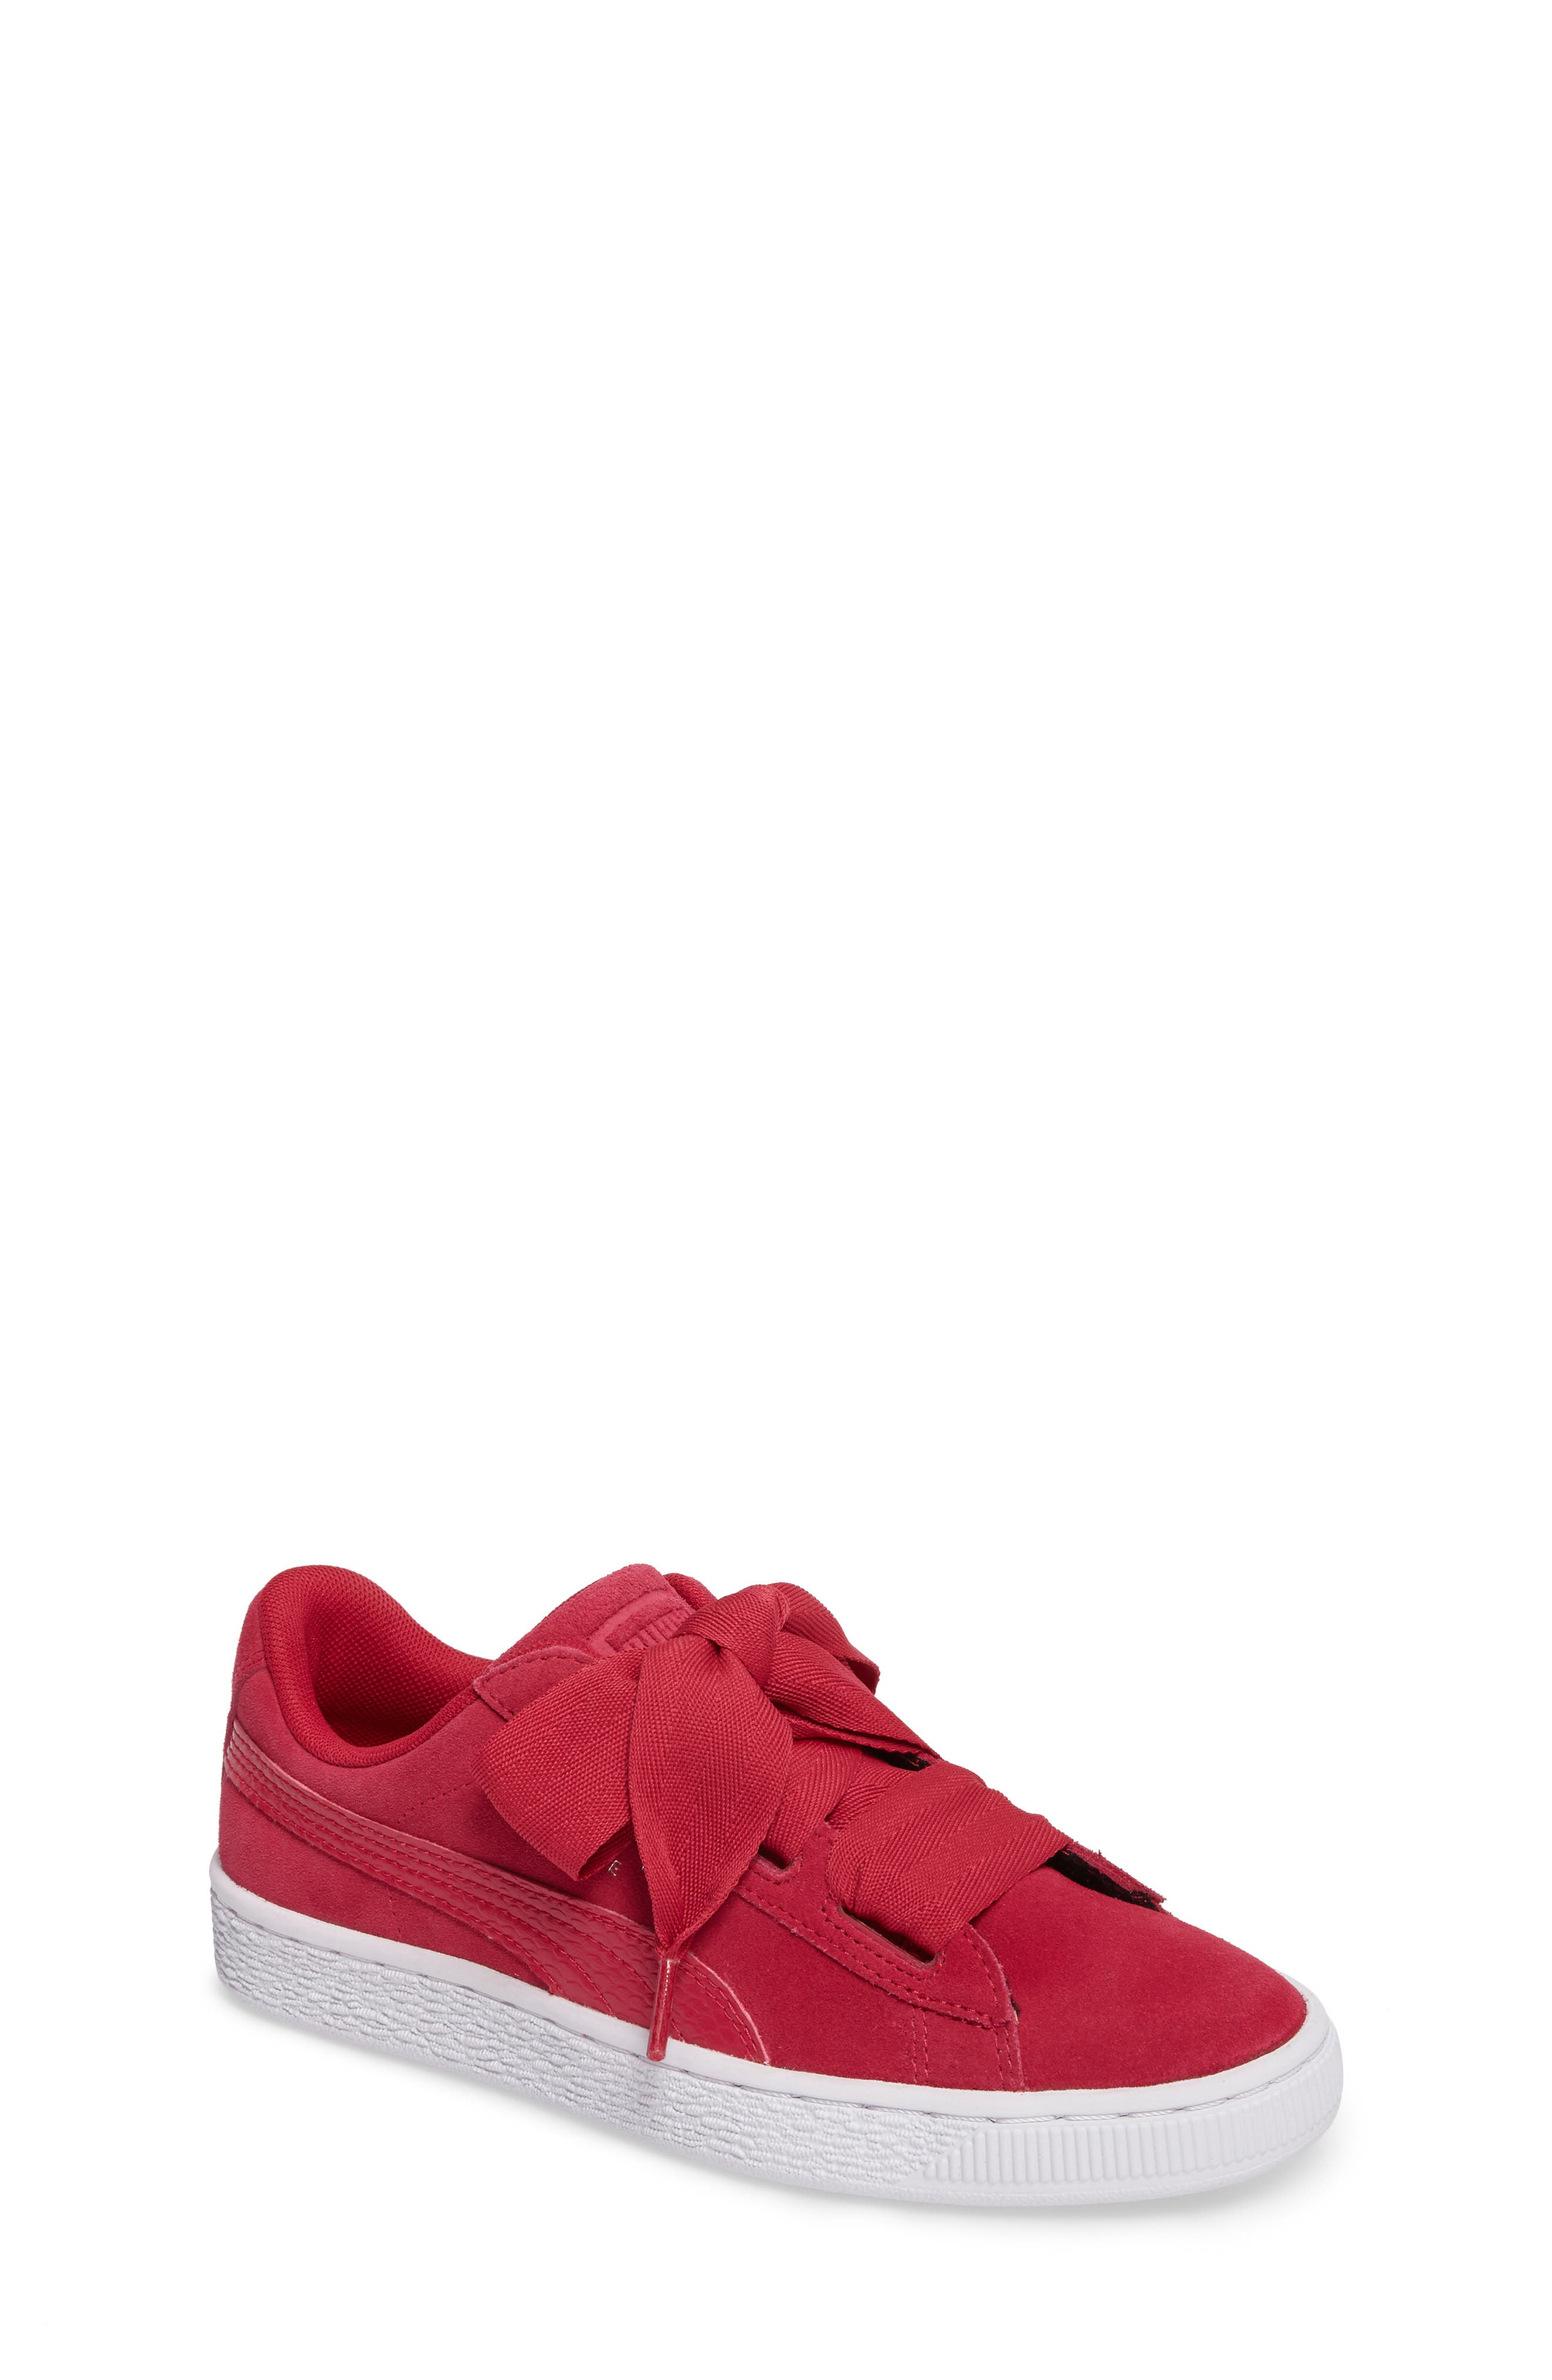 PUMA Suede Heart Jr Sneaker (Big Kid)